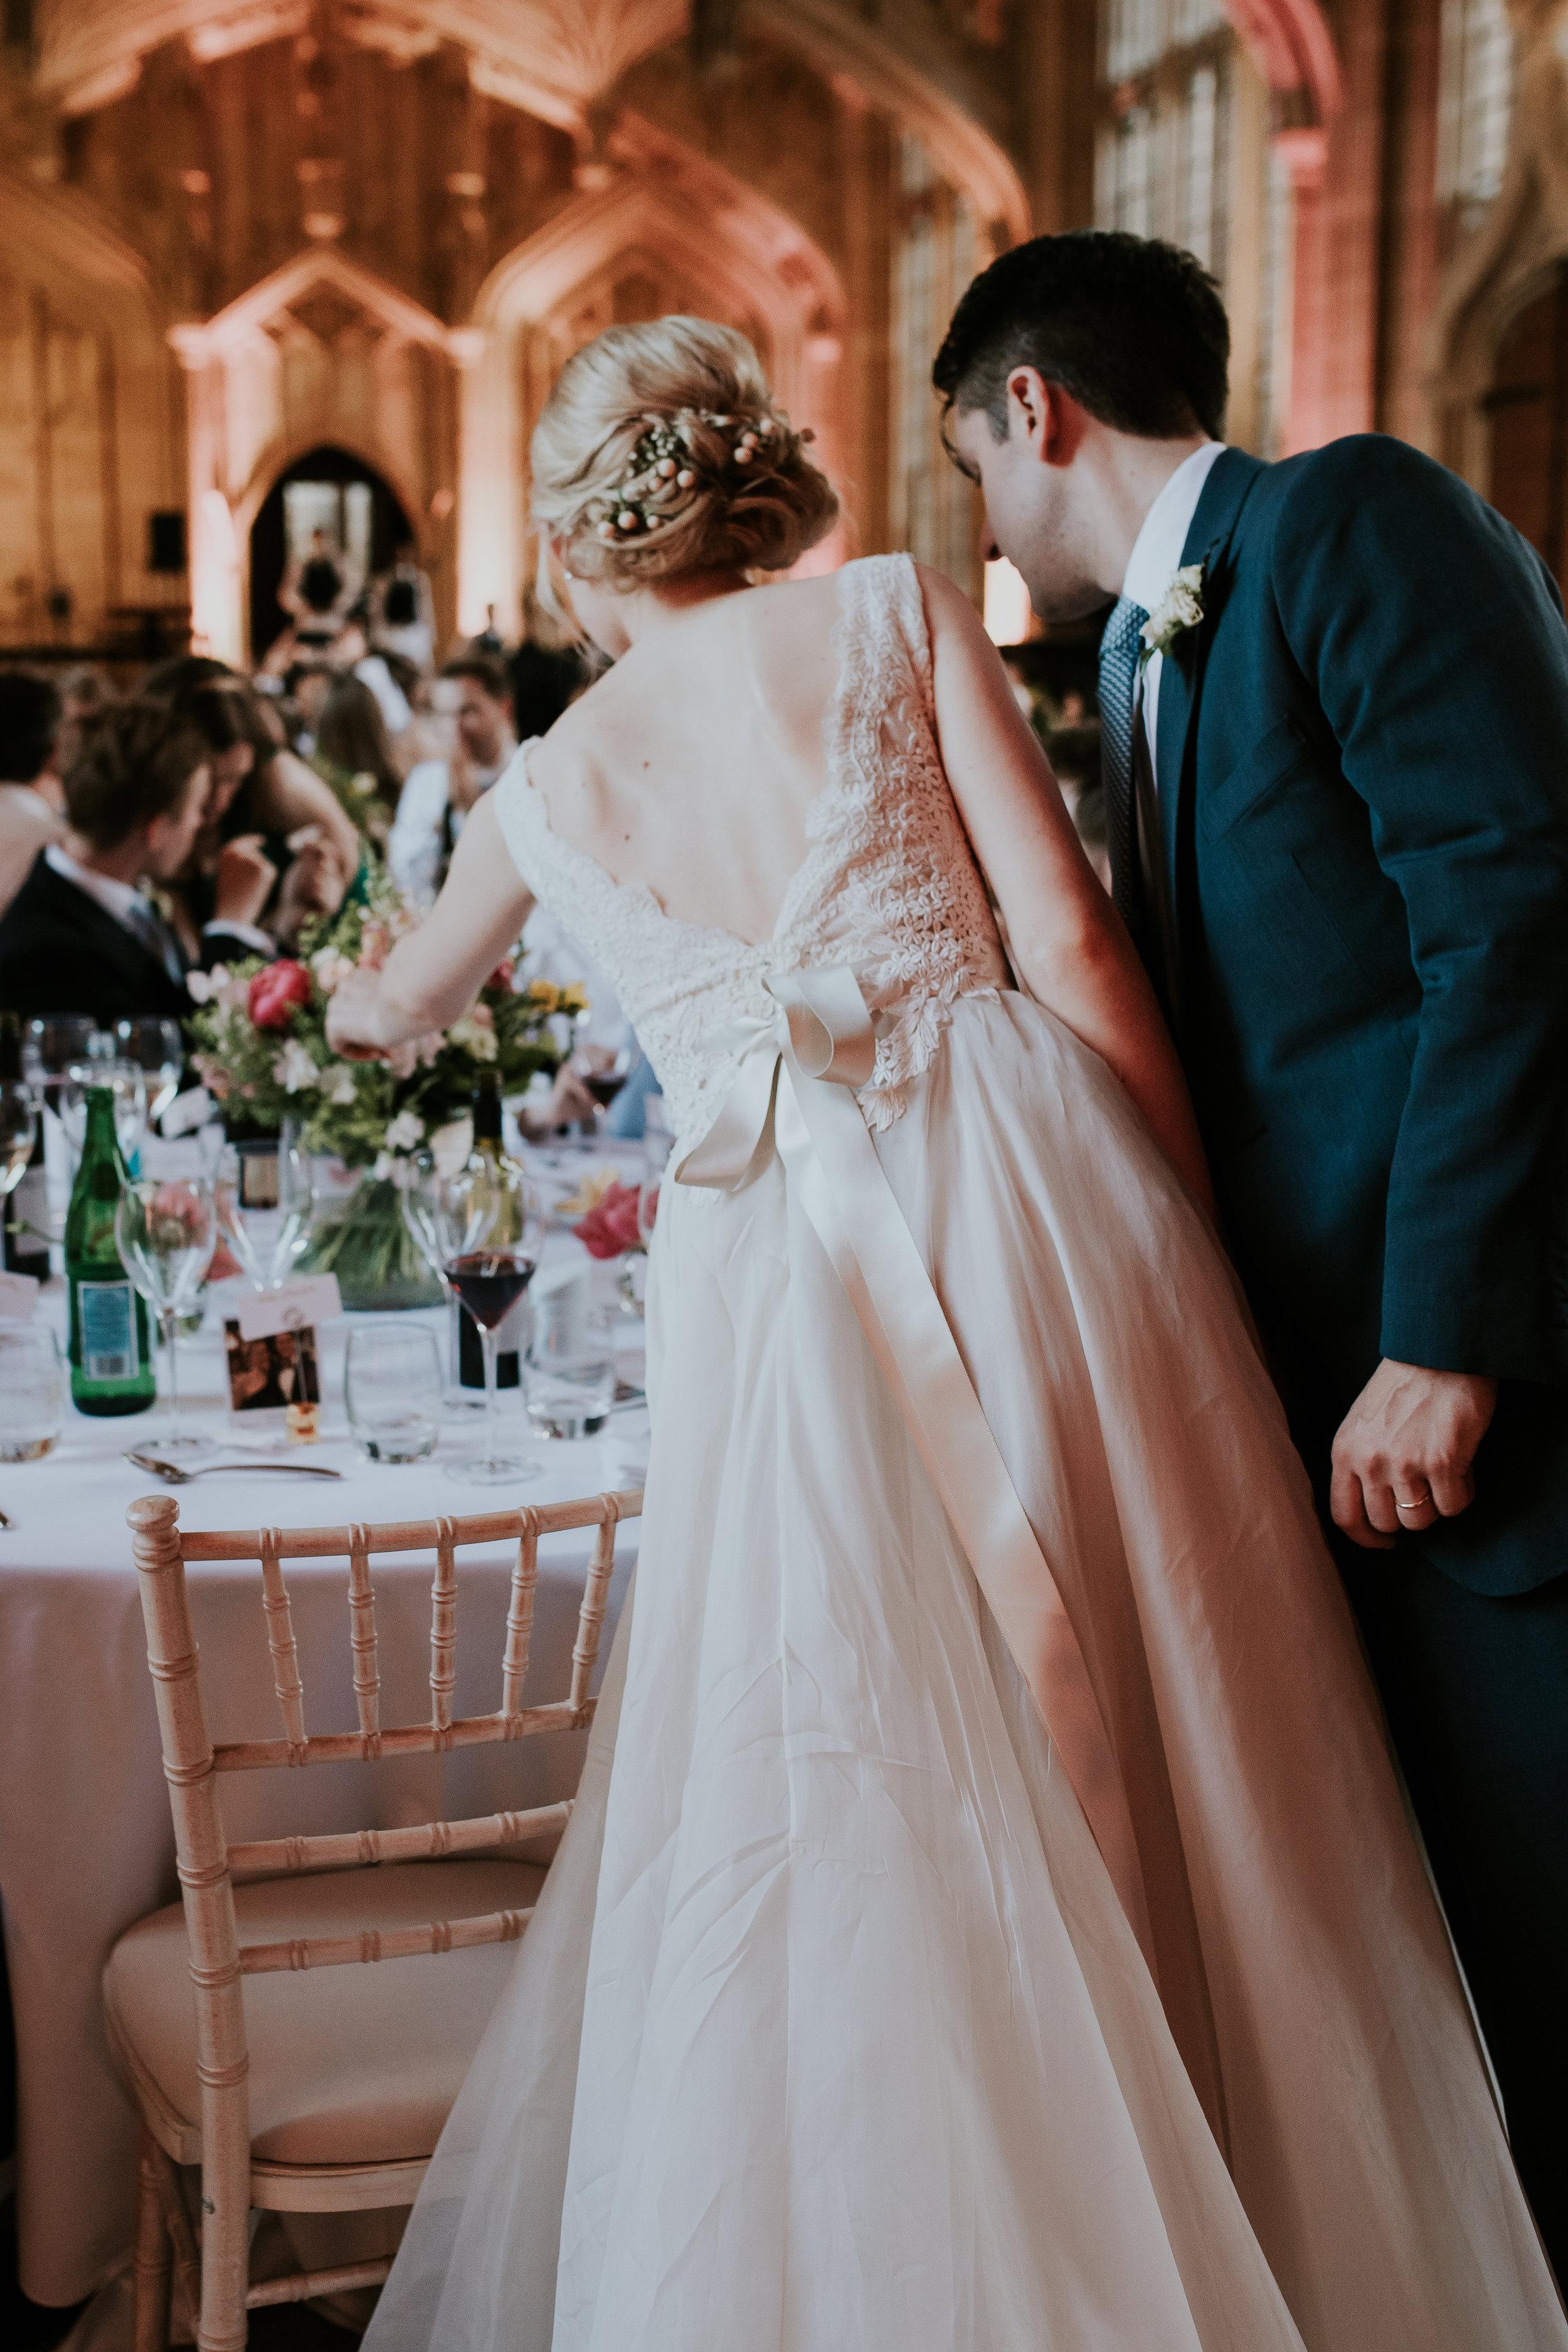 sam-andrew-wedding-pembroke-bodleian-kelechianna-316.jpg